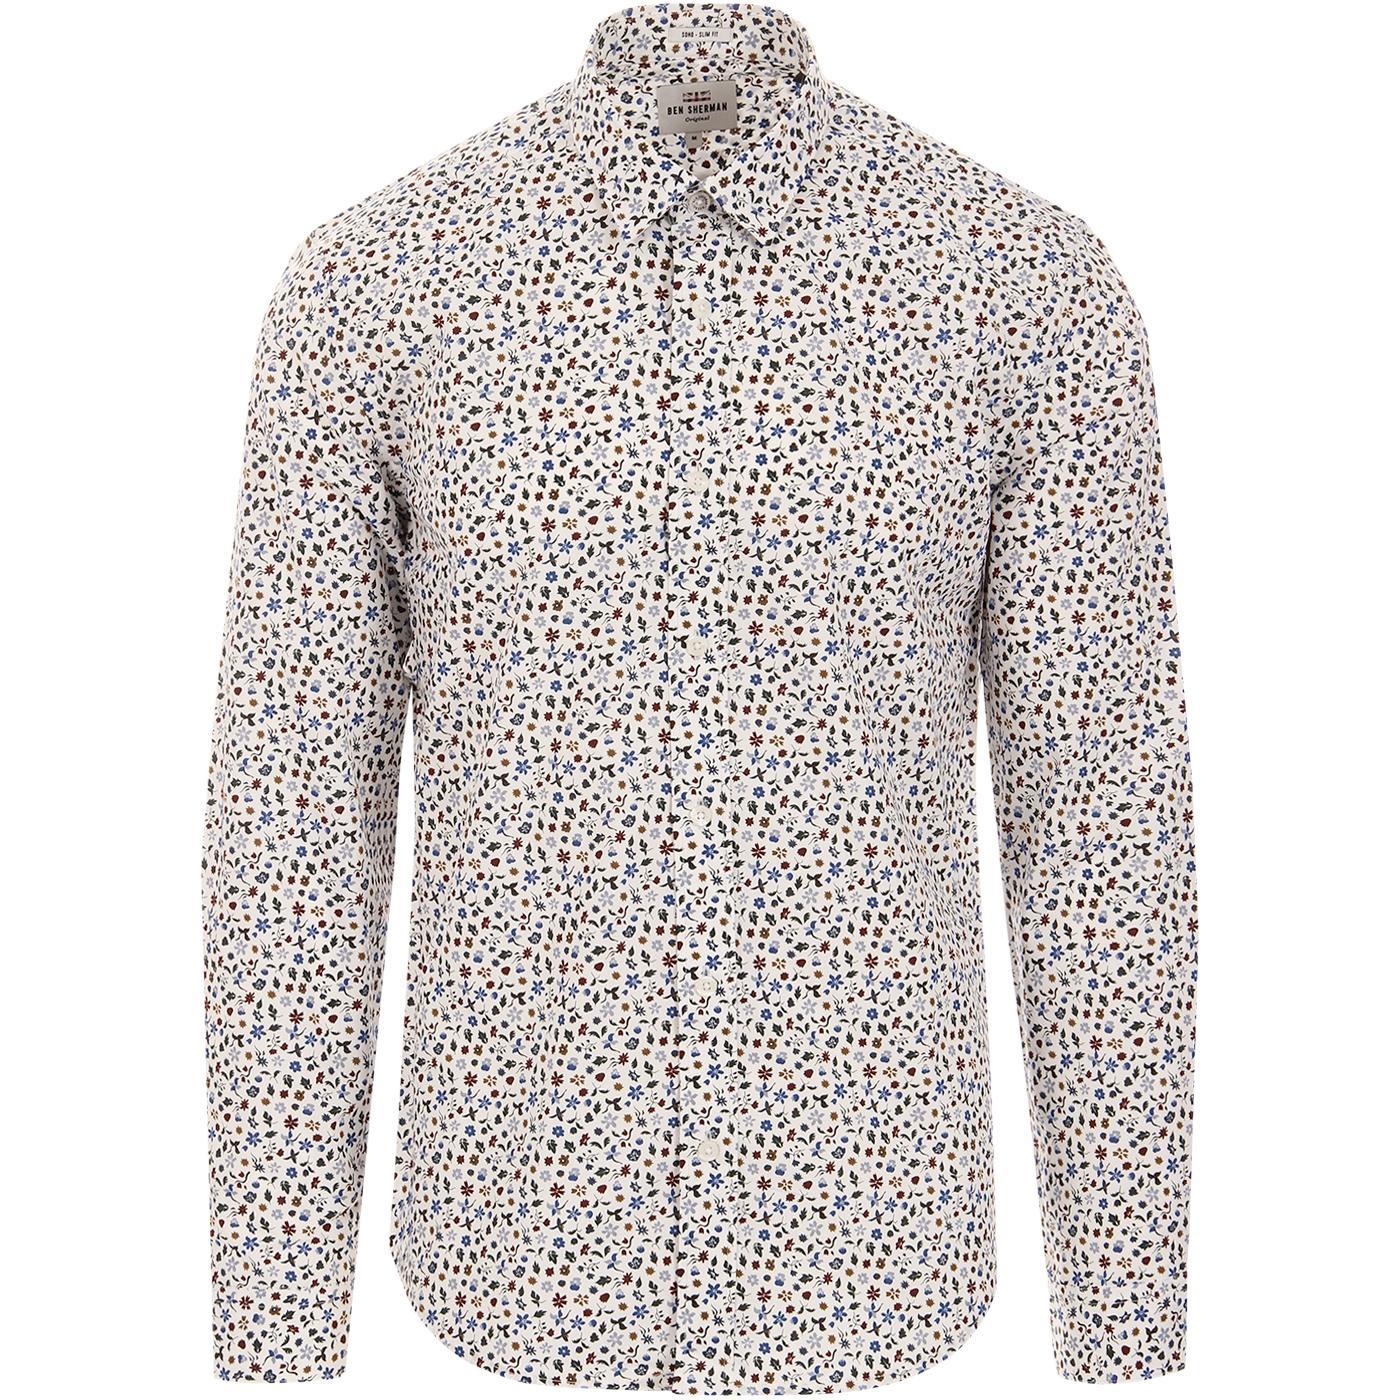 BEN SHERMAN Retro 60s Multi Floral Print Shirt OW